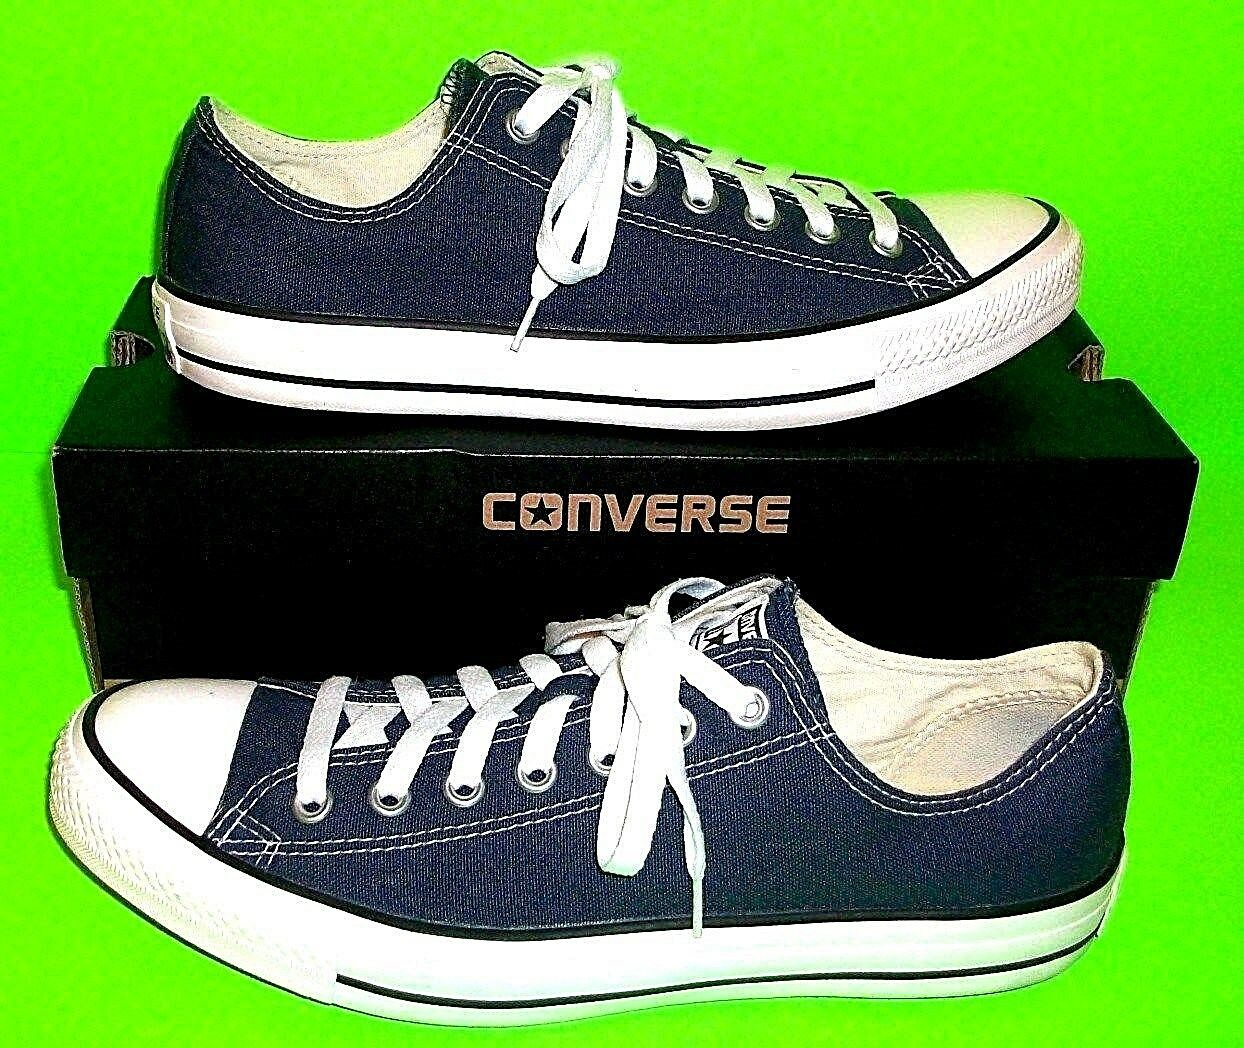 converse chuck taylor all star star bue blu blu bue m9697 uomini scarpe taglia 10 838a57